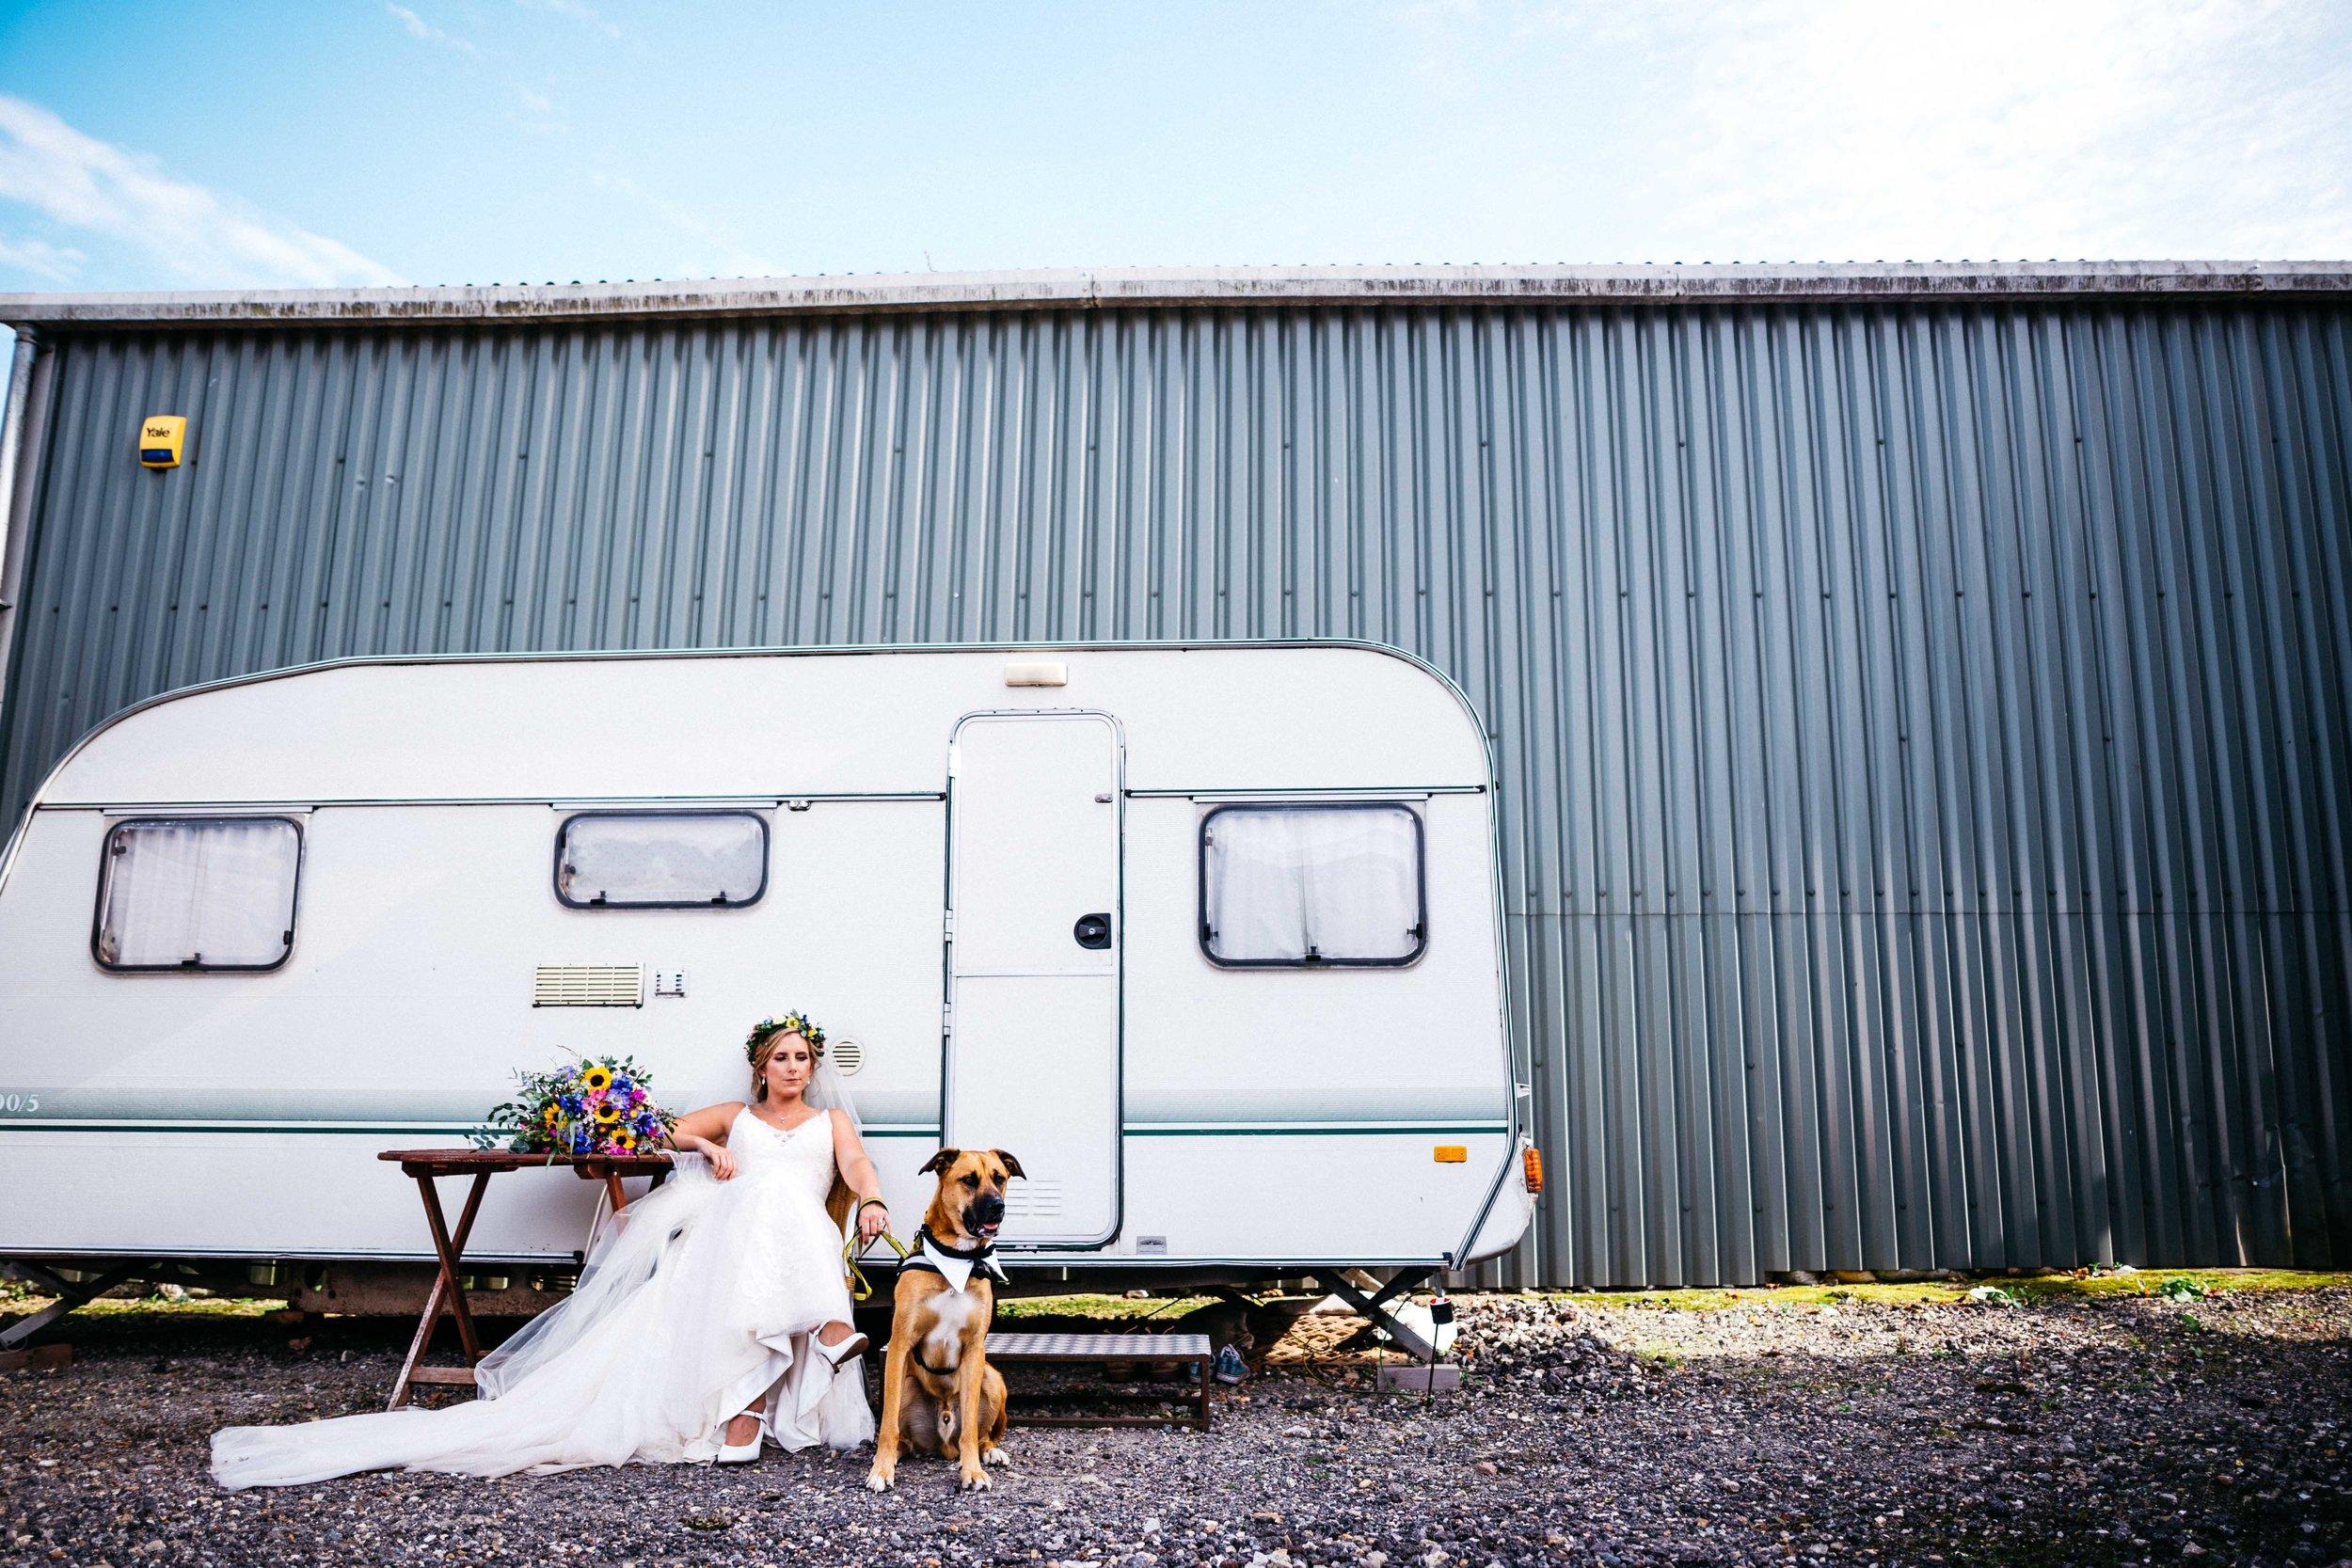 Trailer park bride